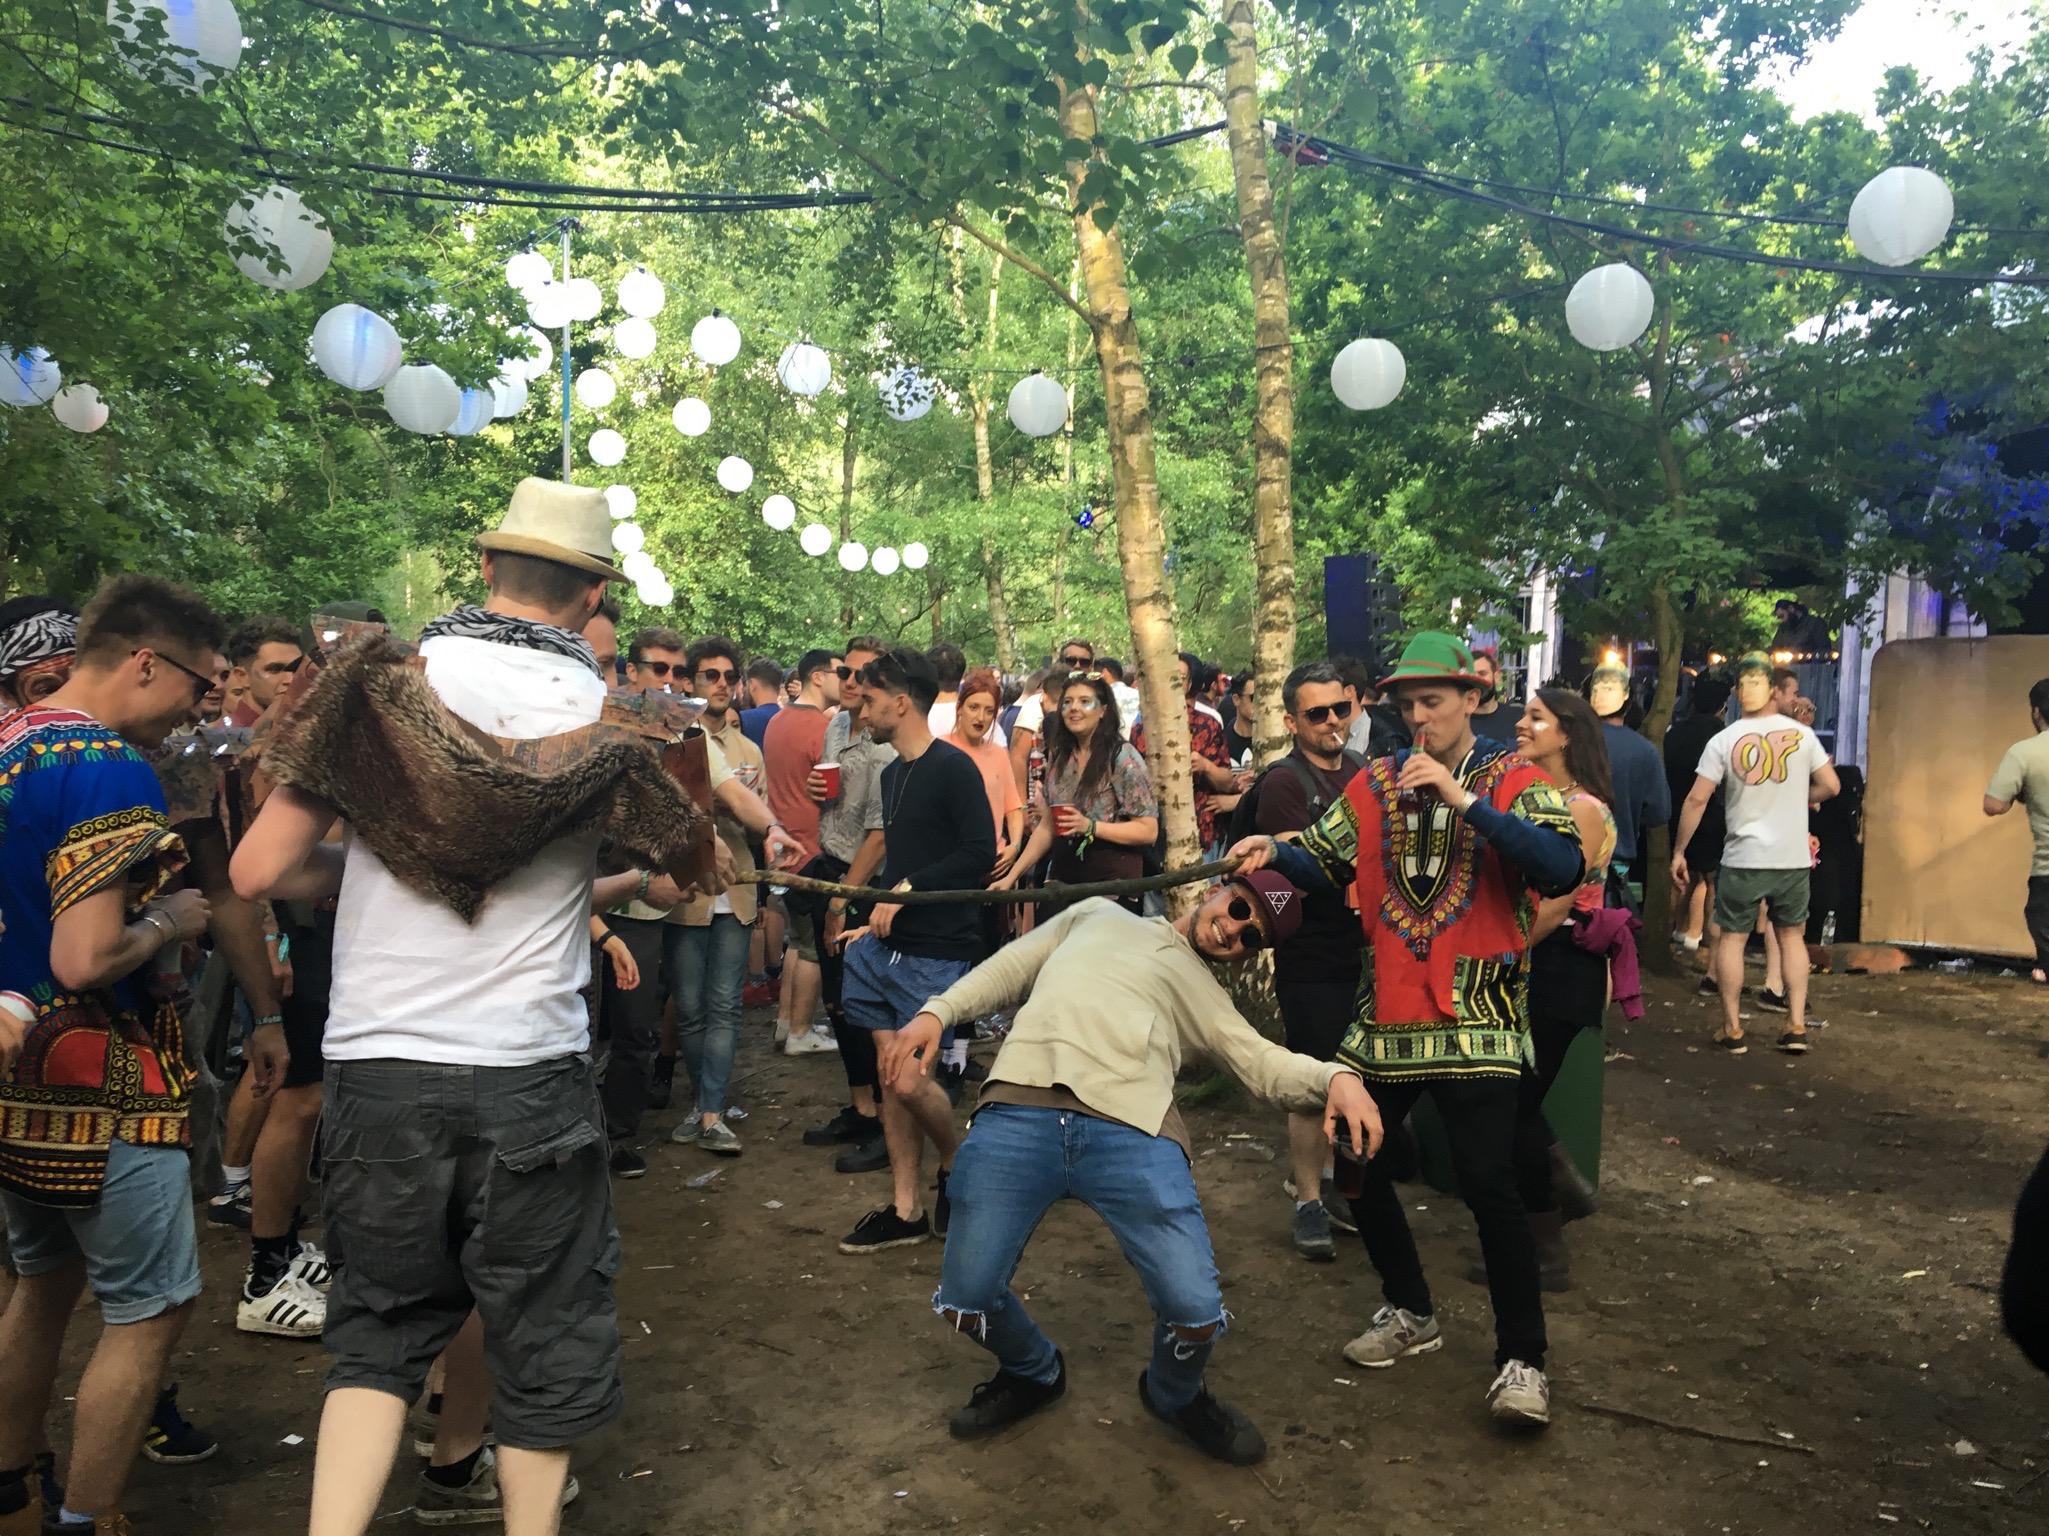 Limbo dancing tribe